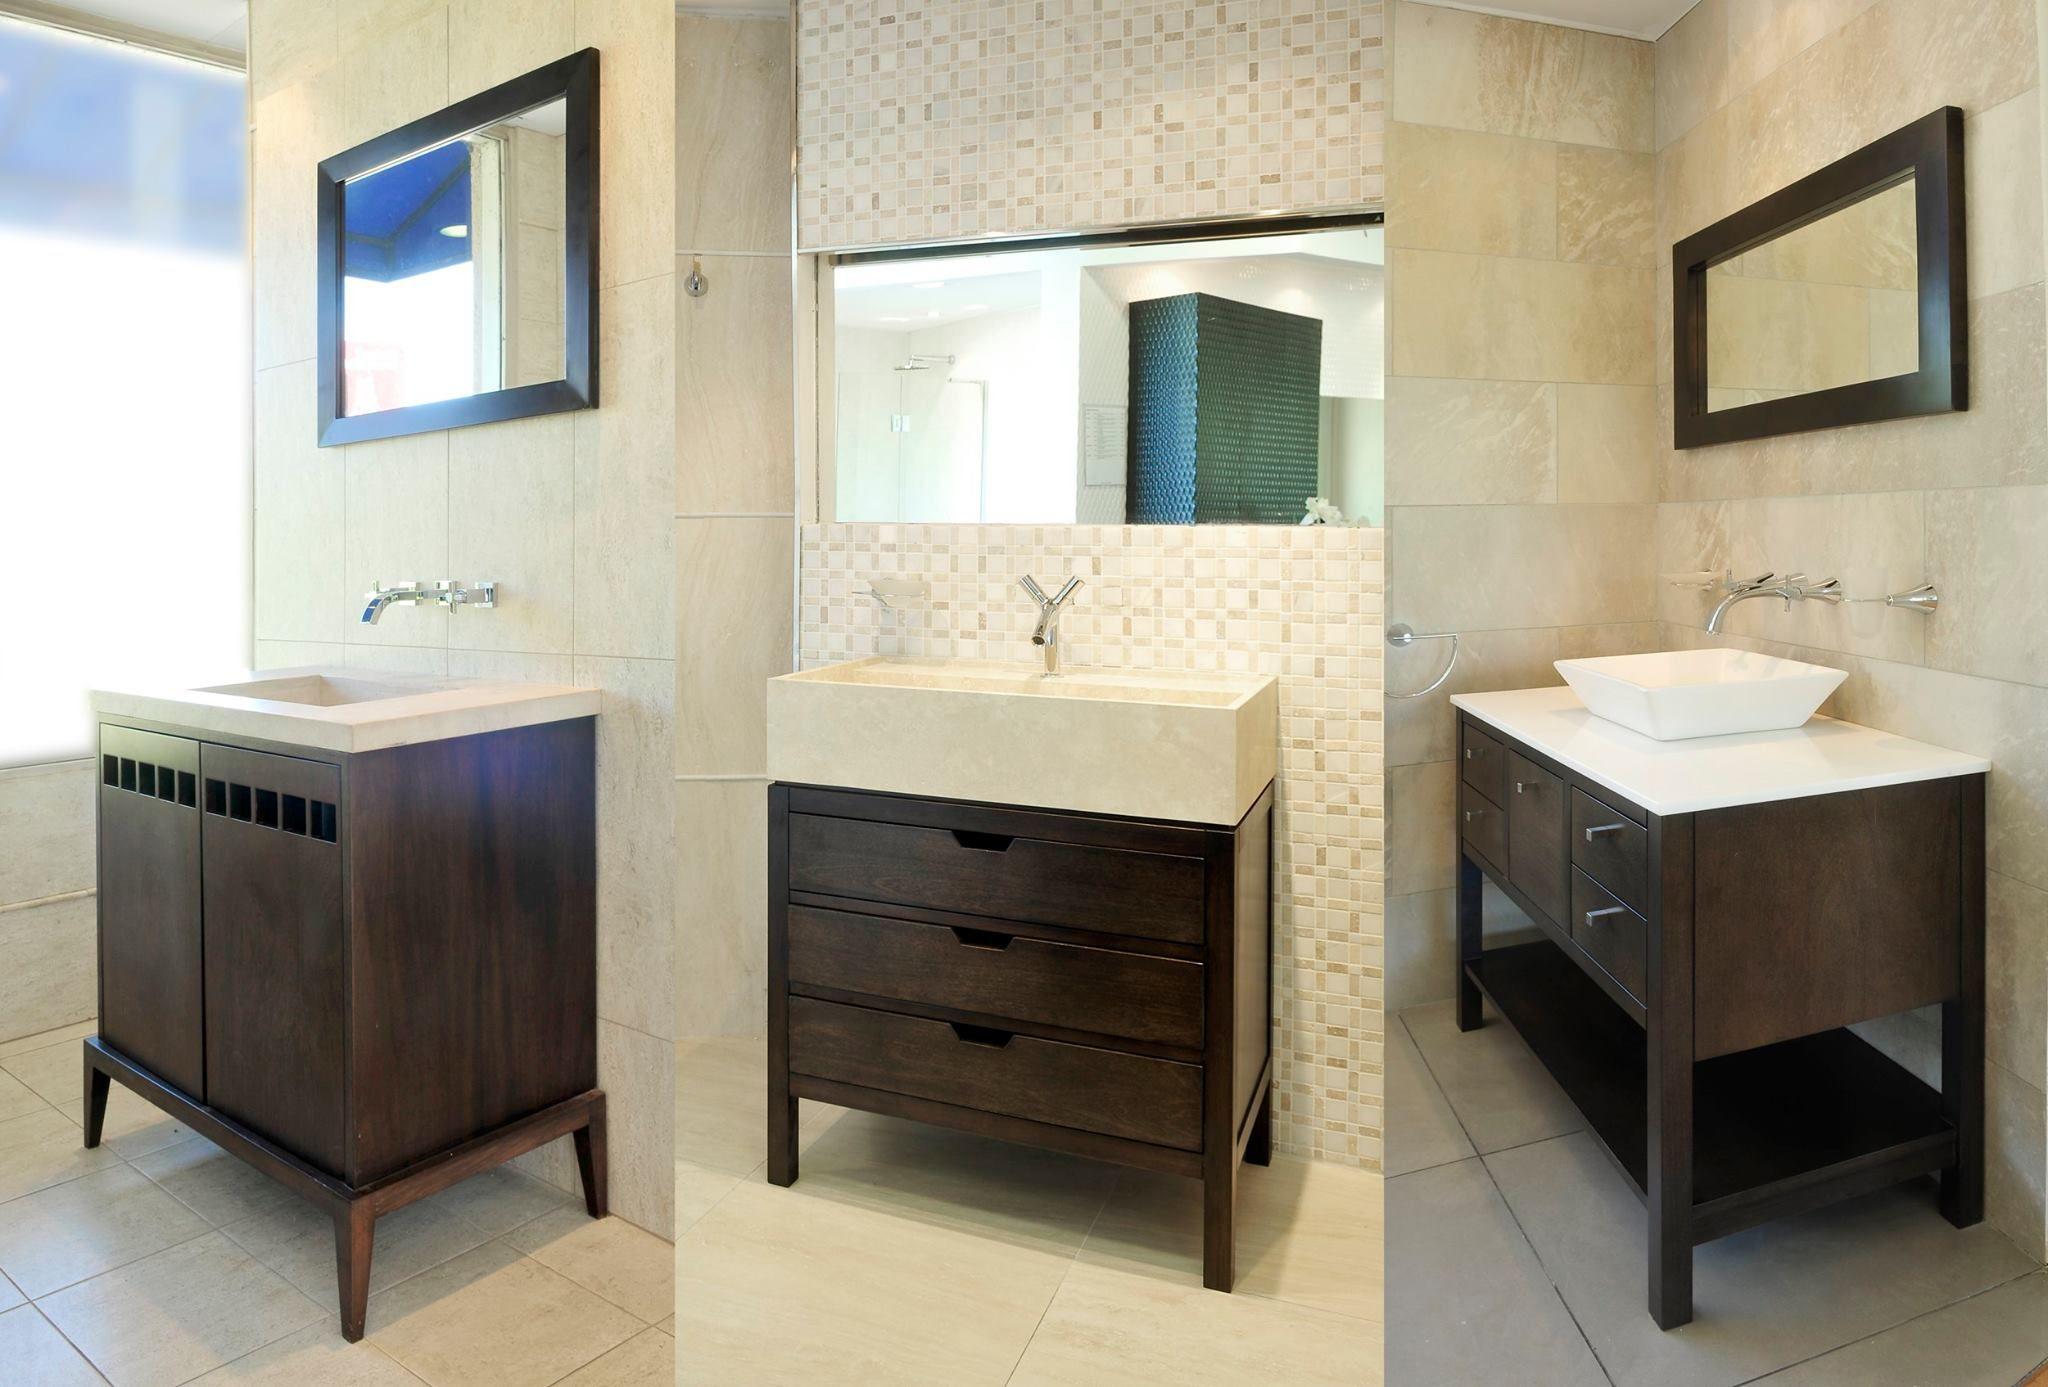 Muebles de madera para tu ba o que estilo te representa m s pondr as un mueble as en tu ba o - Mas que muebles ...